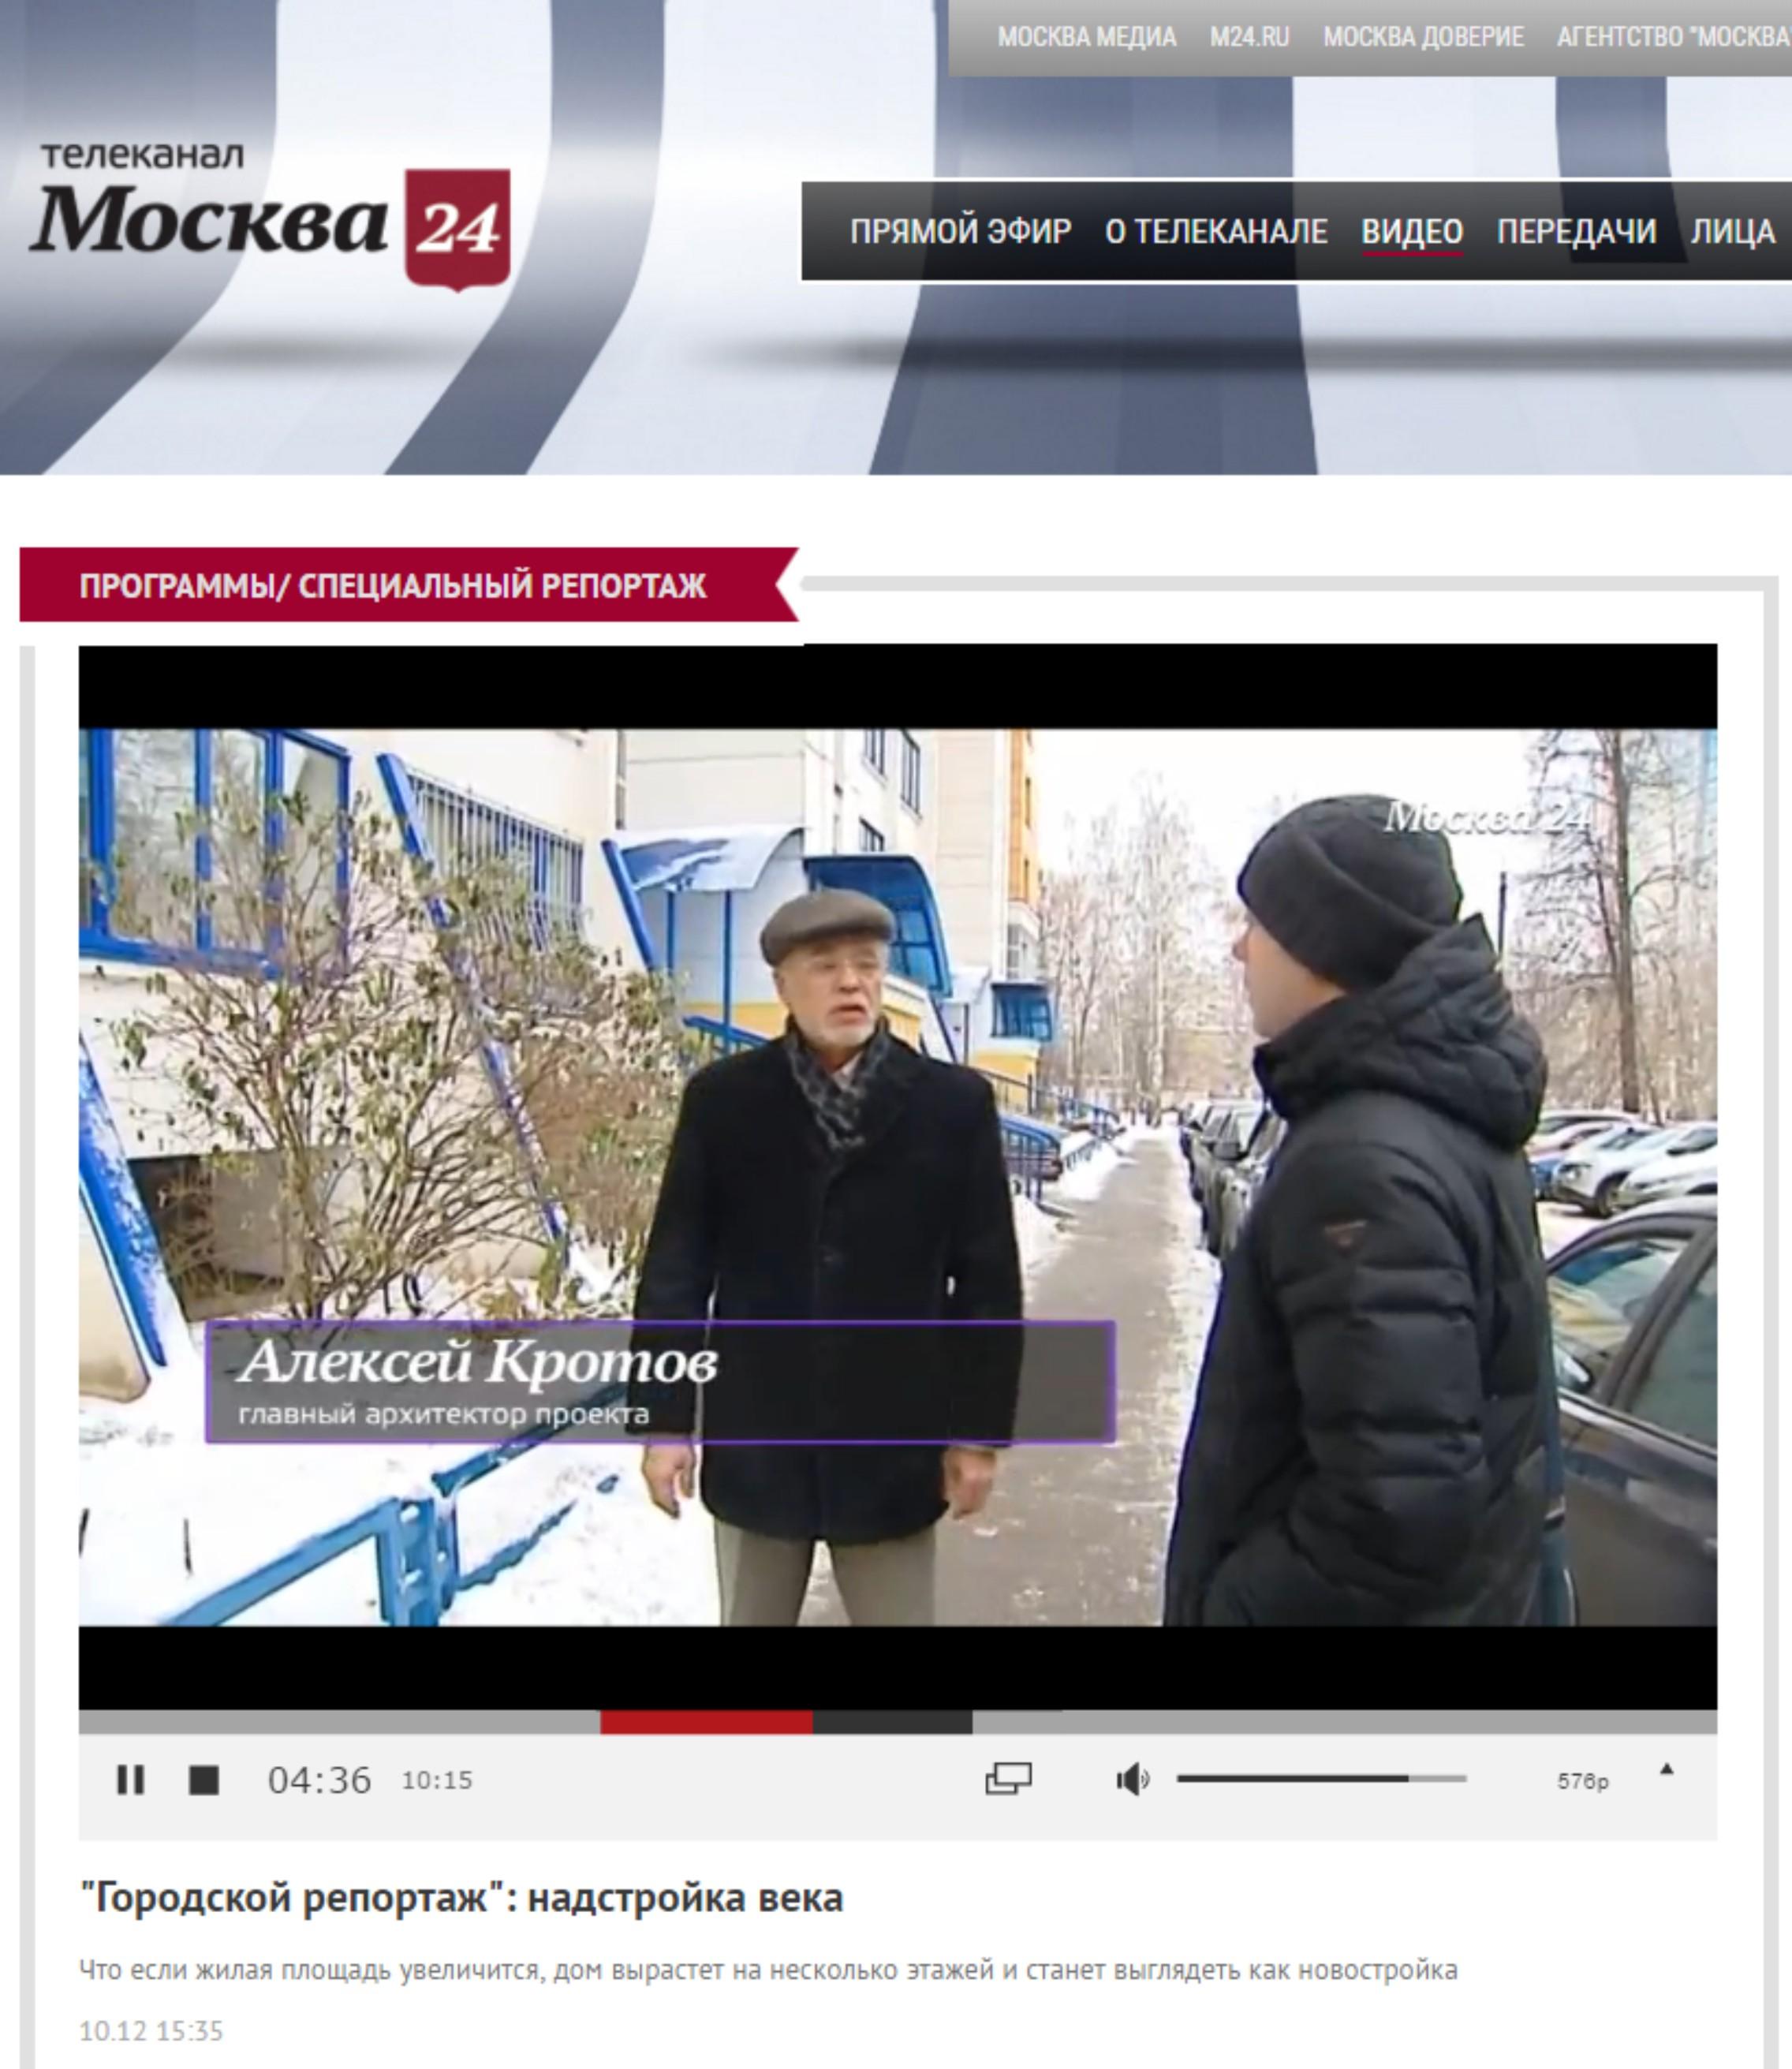 Телеканал: Москва 24